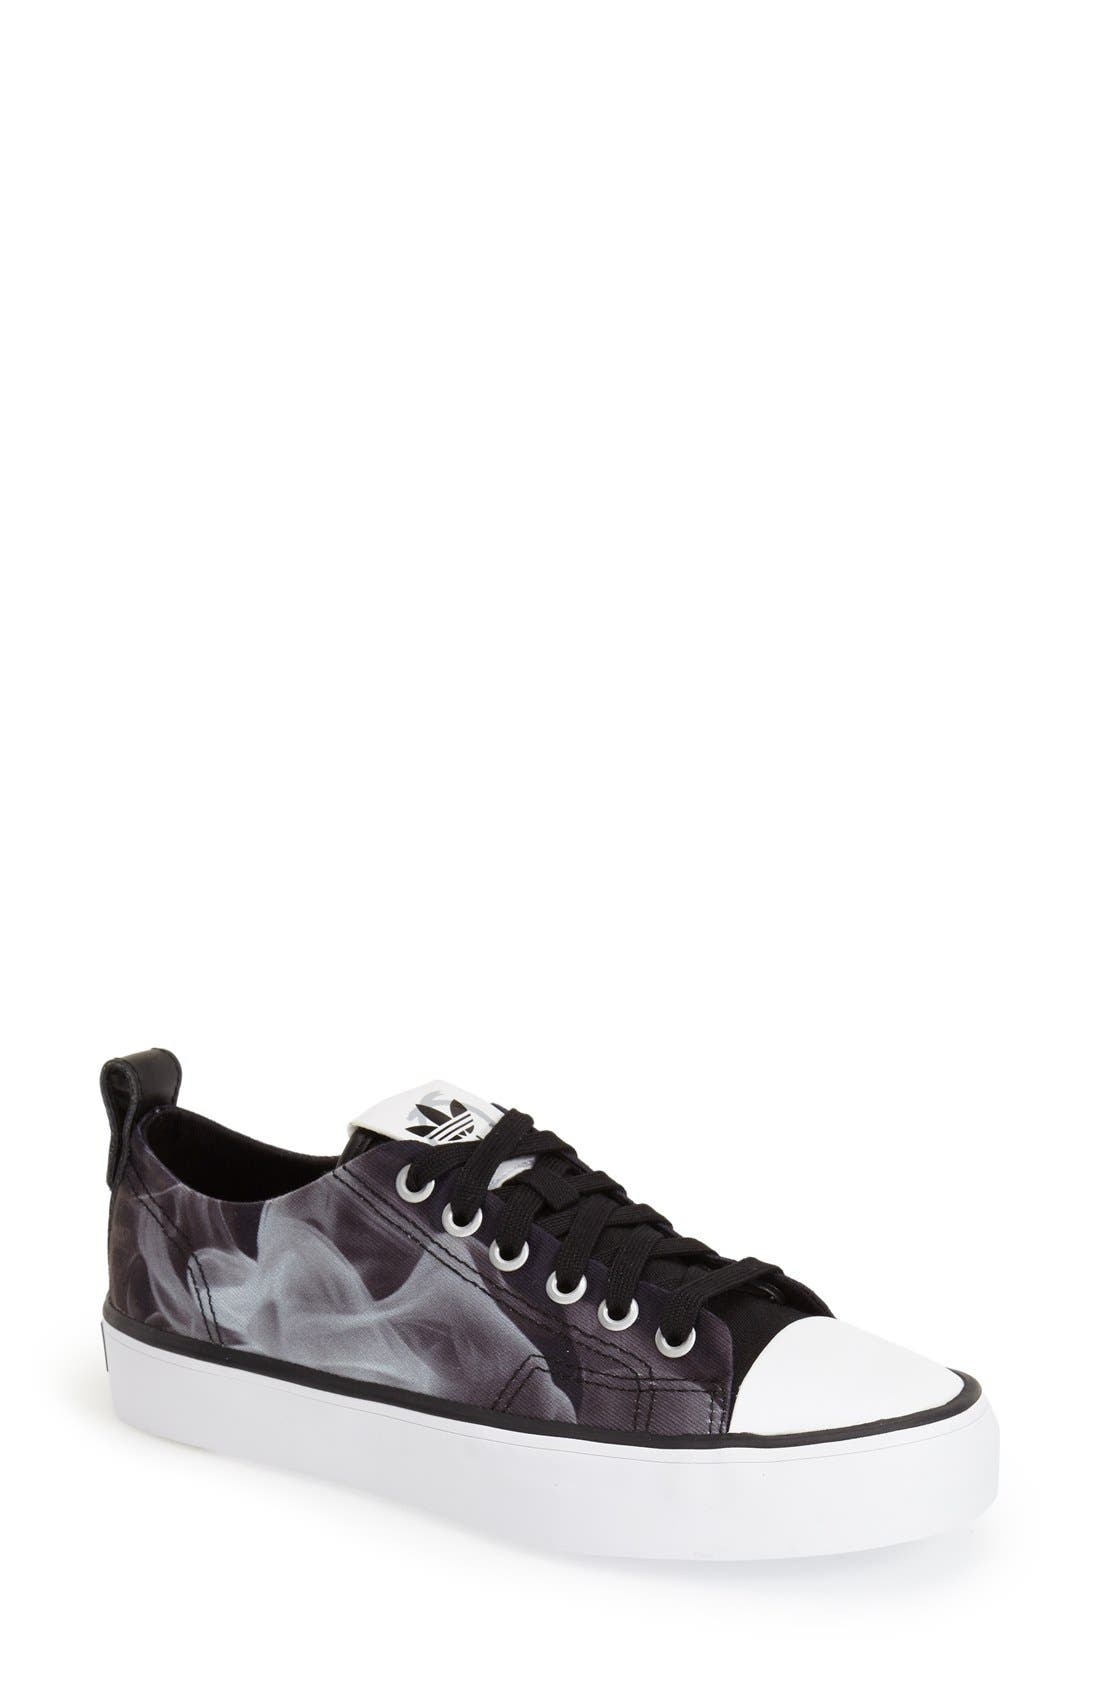 Main Image - adidas 'Honey 2.0 - Rita Ora' Sneaker (Women)